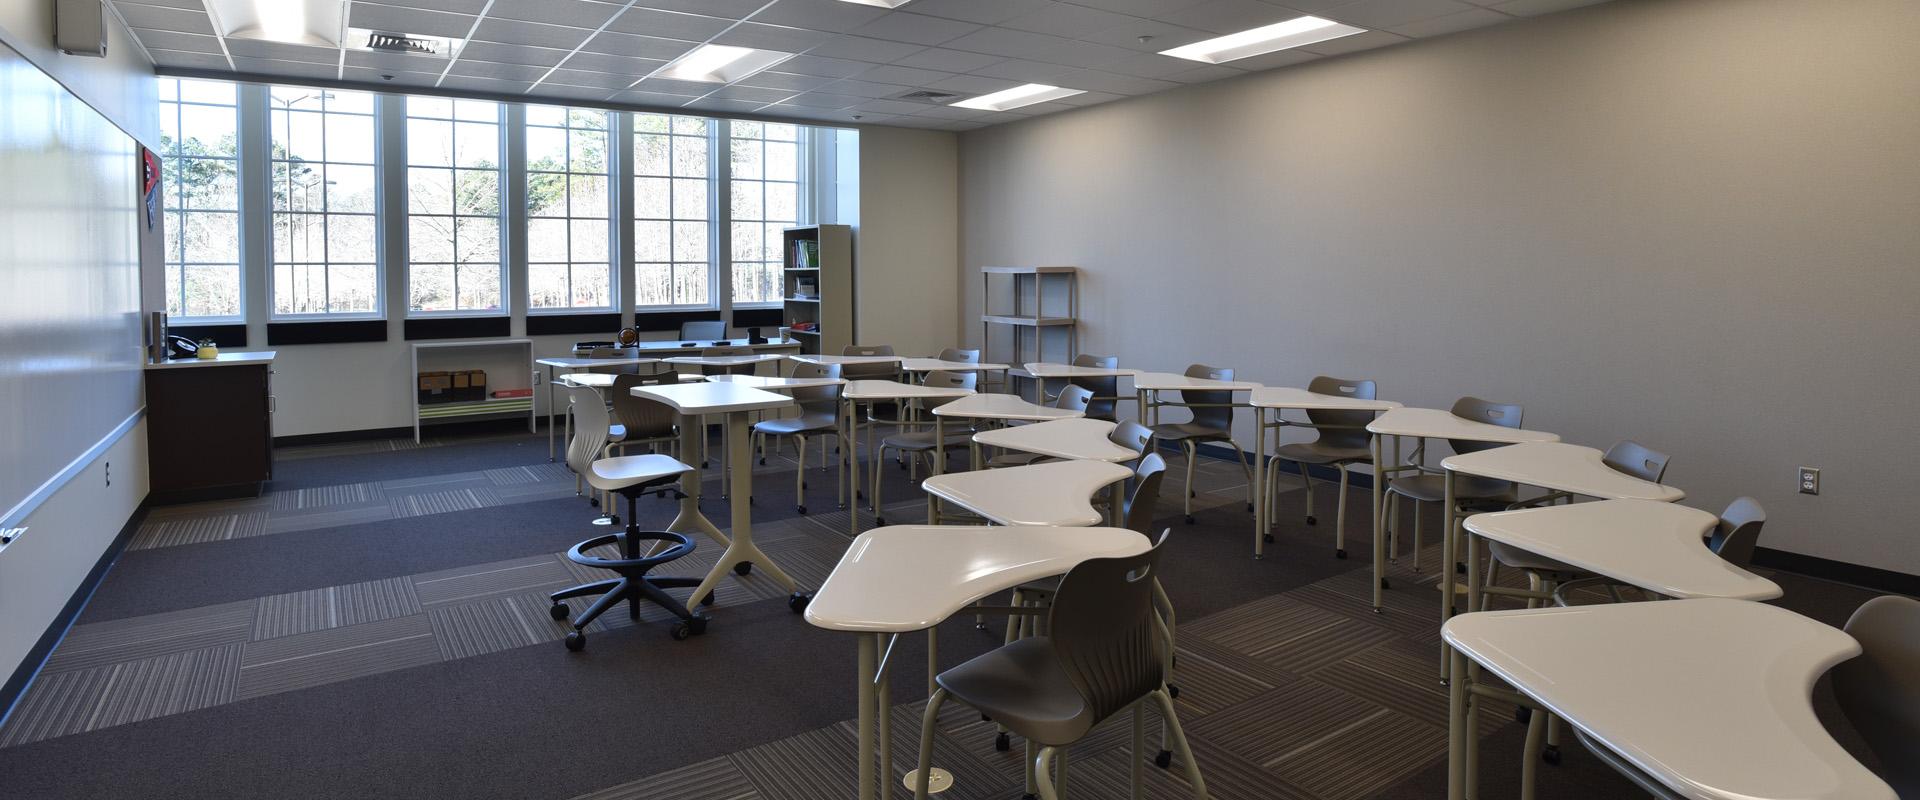 Kings Ridge Christian School - Classroom